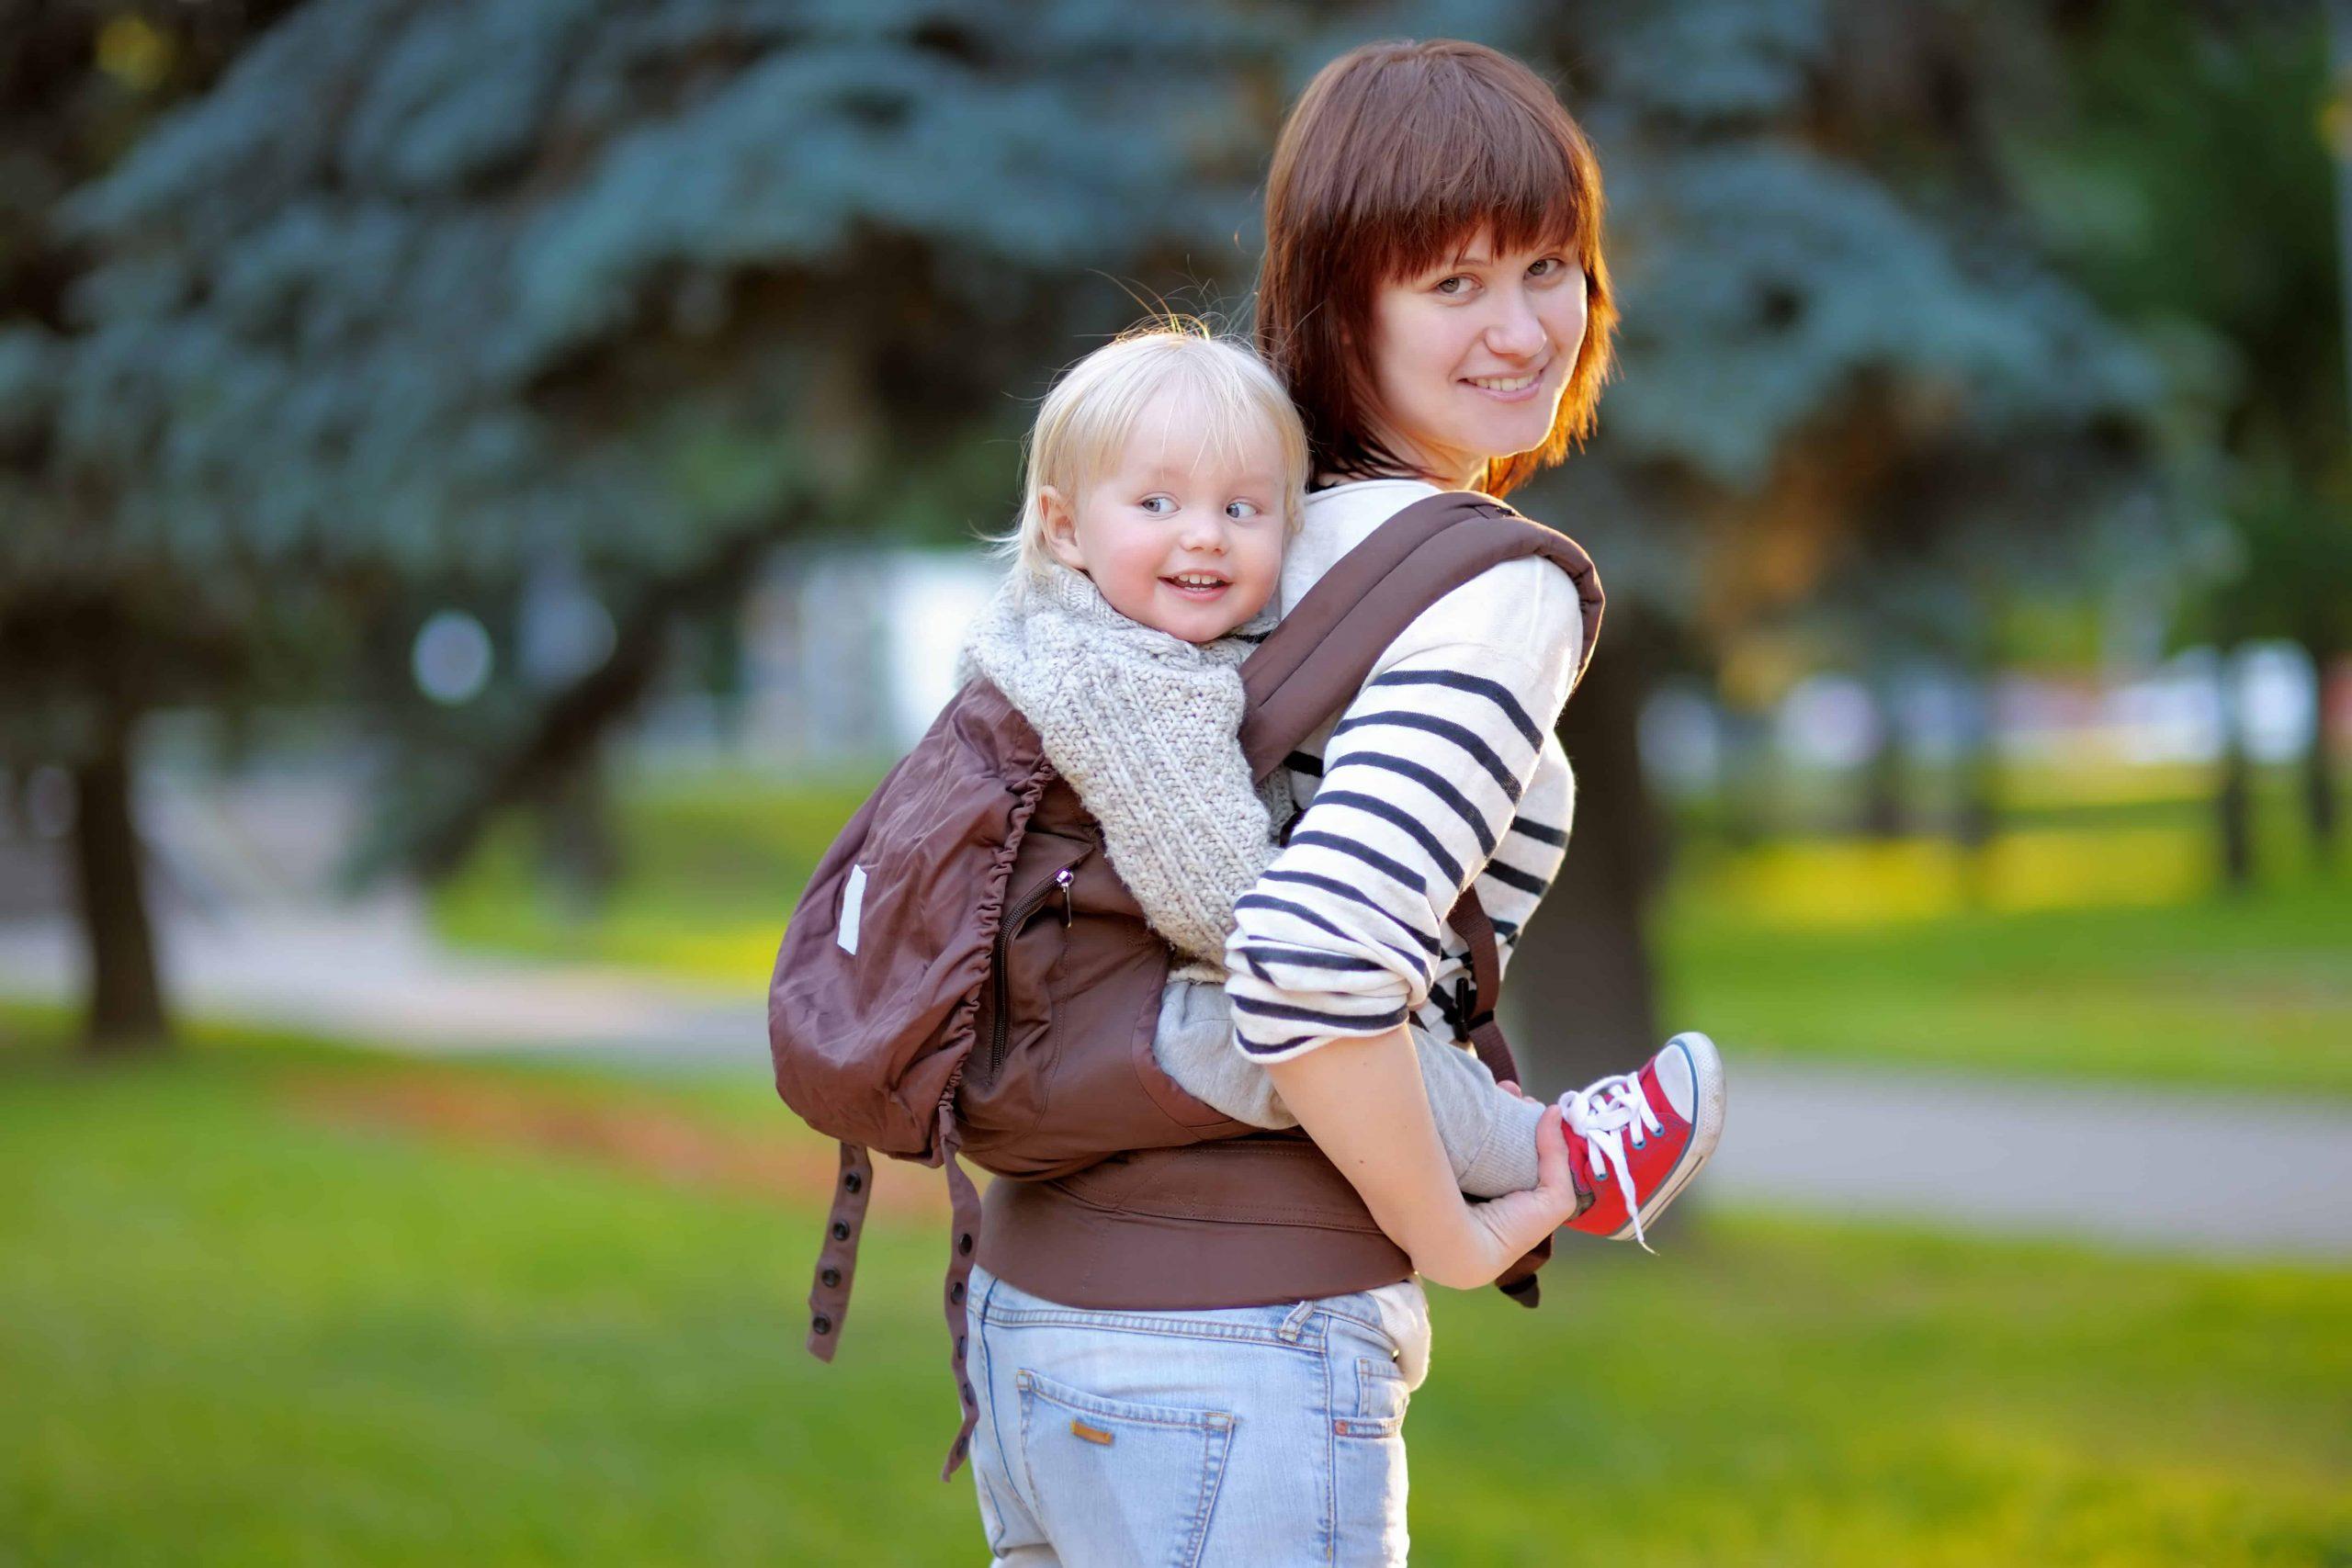 Cangurera para bebé: ¿Cuál es la mejor del 2020?